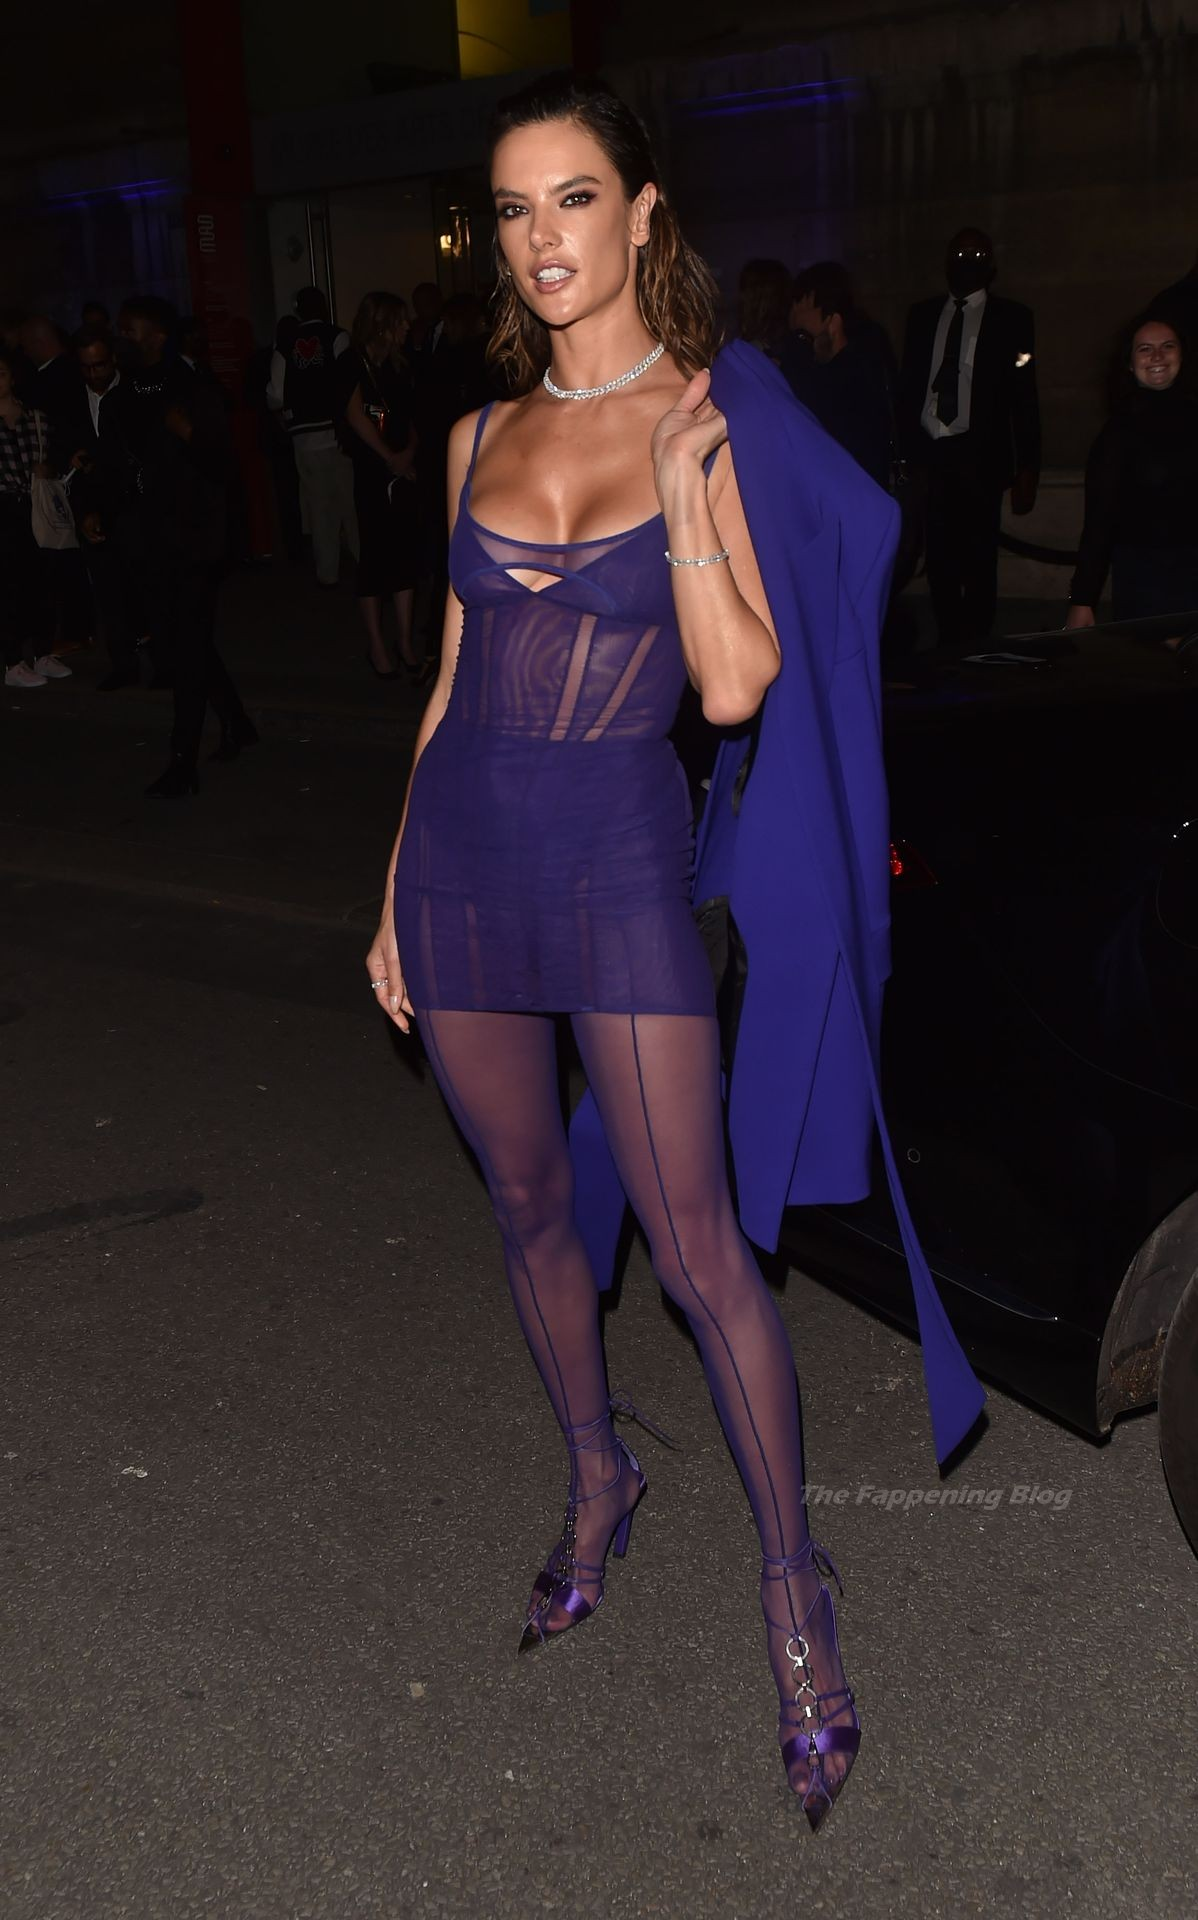 Alessandra-Ambrosio-Sexy-The-Fappening-Blog-81-1.jpg